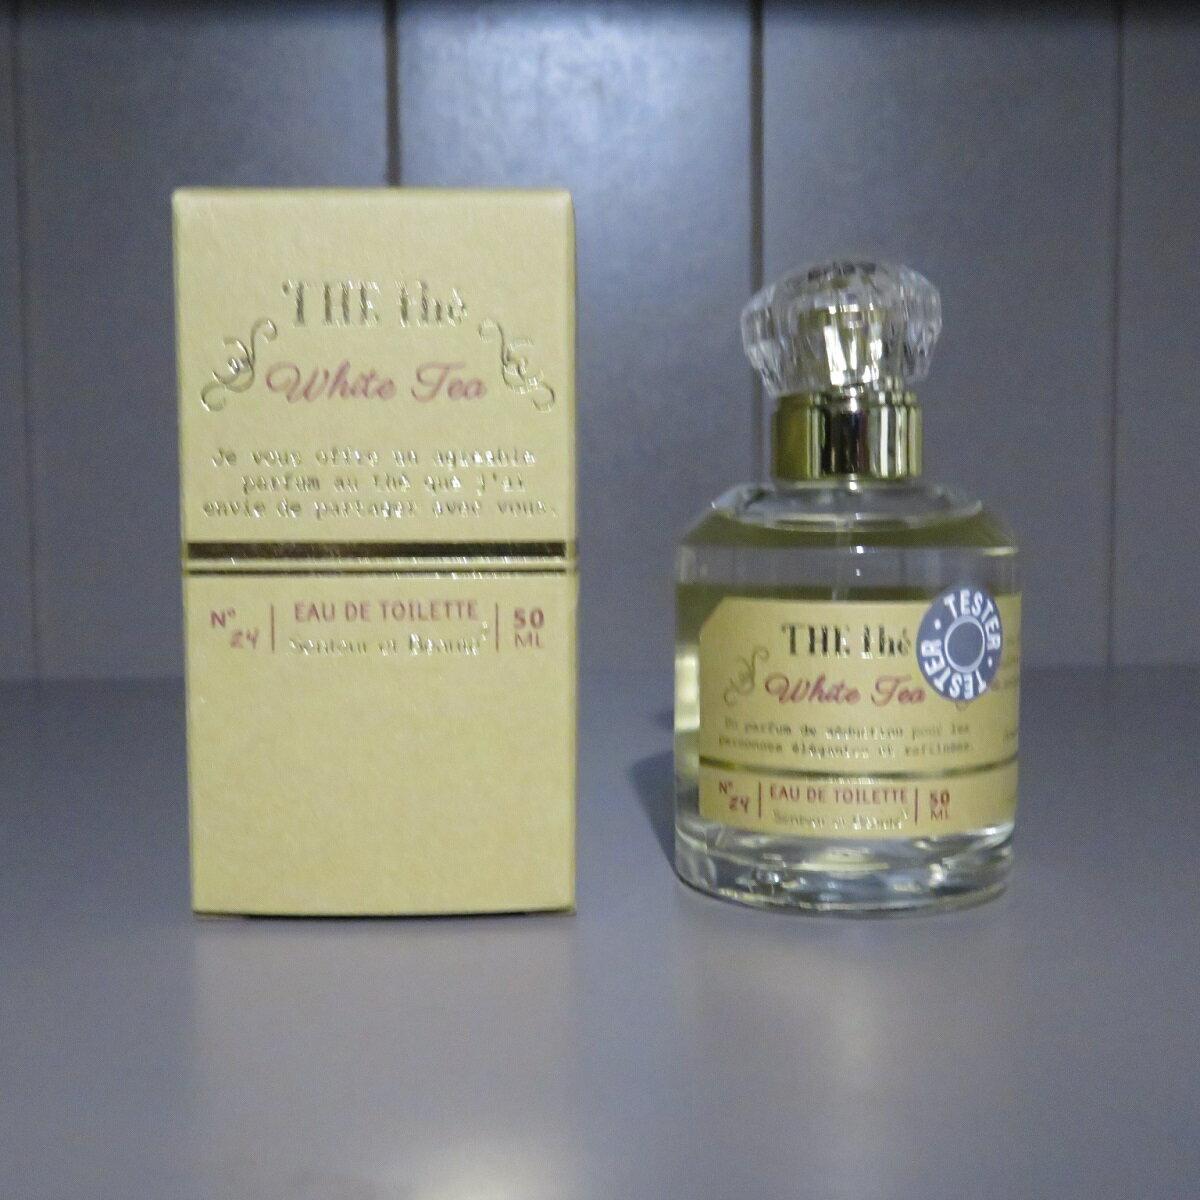 Senteur et Beaute(サンタールエボーテ)ザ・ティー オードトワレ50ml【正規品】【THE the】【香水】【一部地域】こちらは新しいシリーズです。